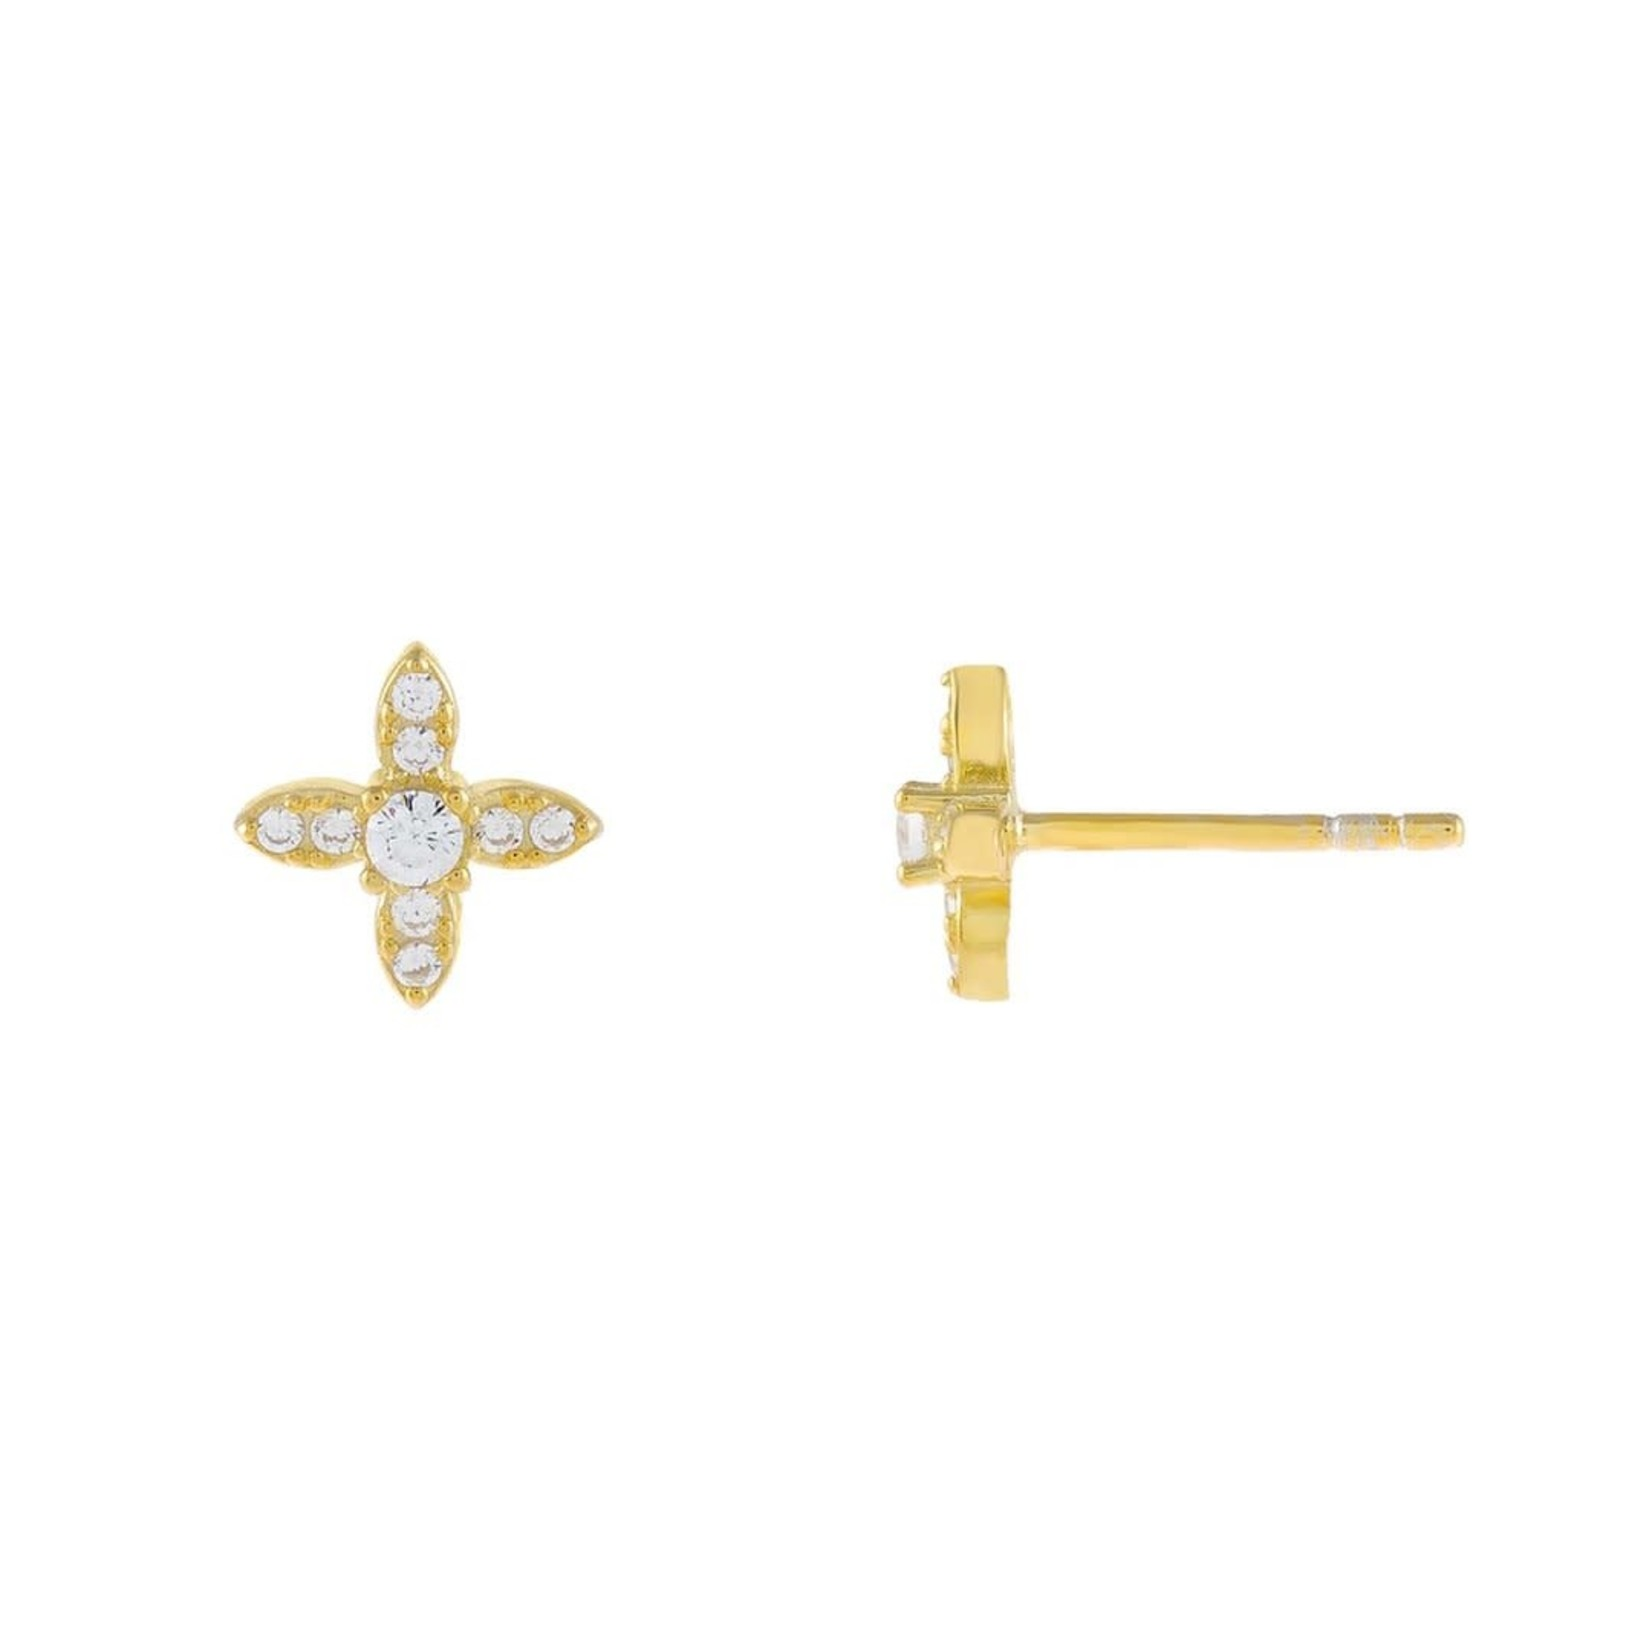 Adinas CZ Crystal 4 Petal Flower Stud Earrings